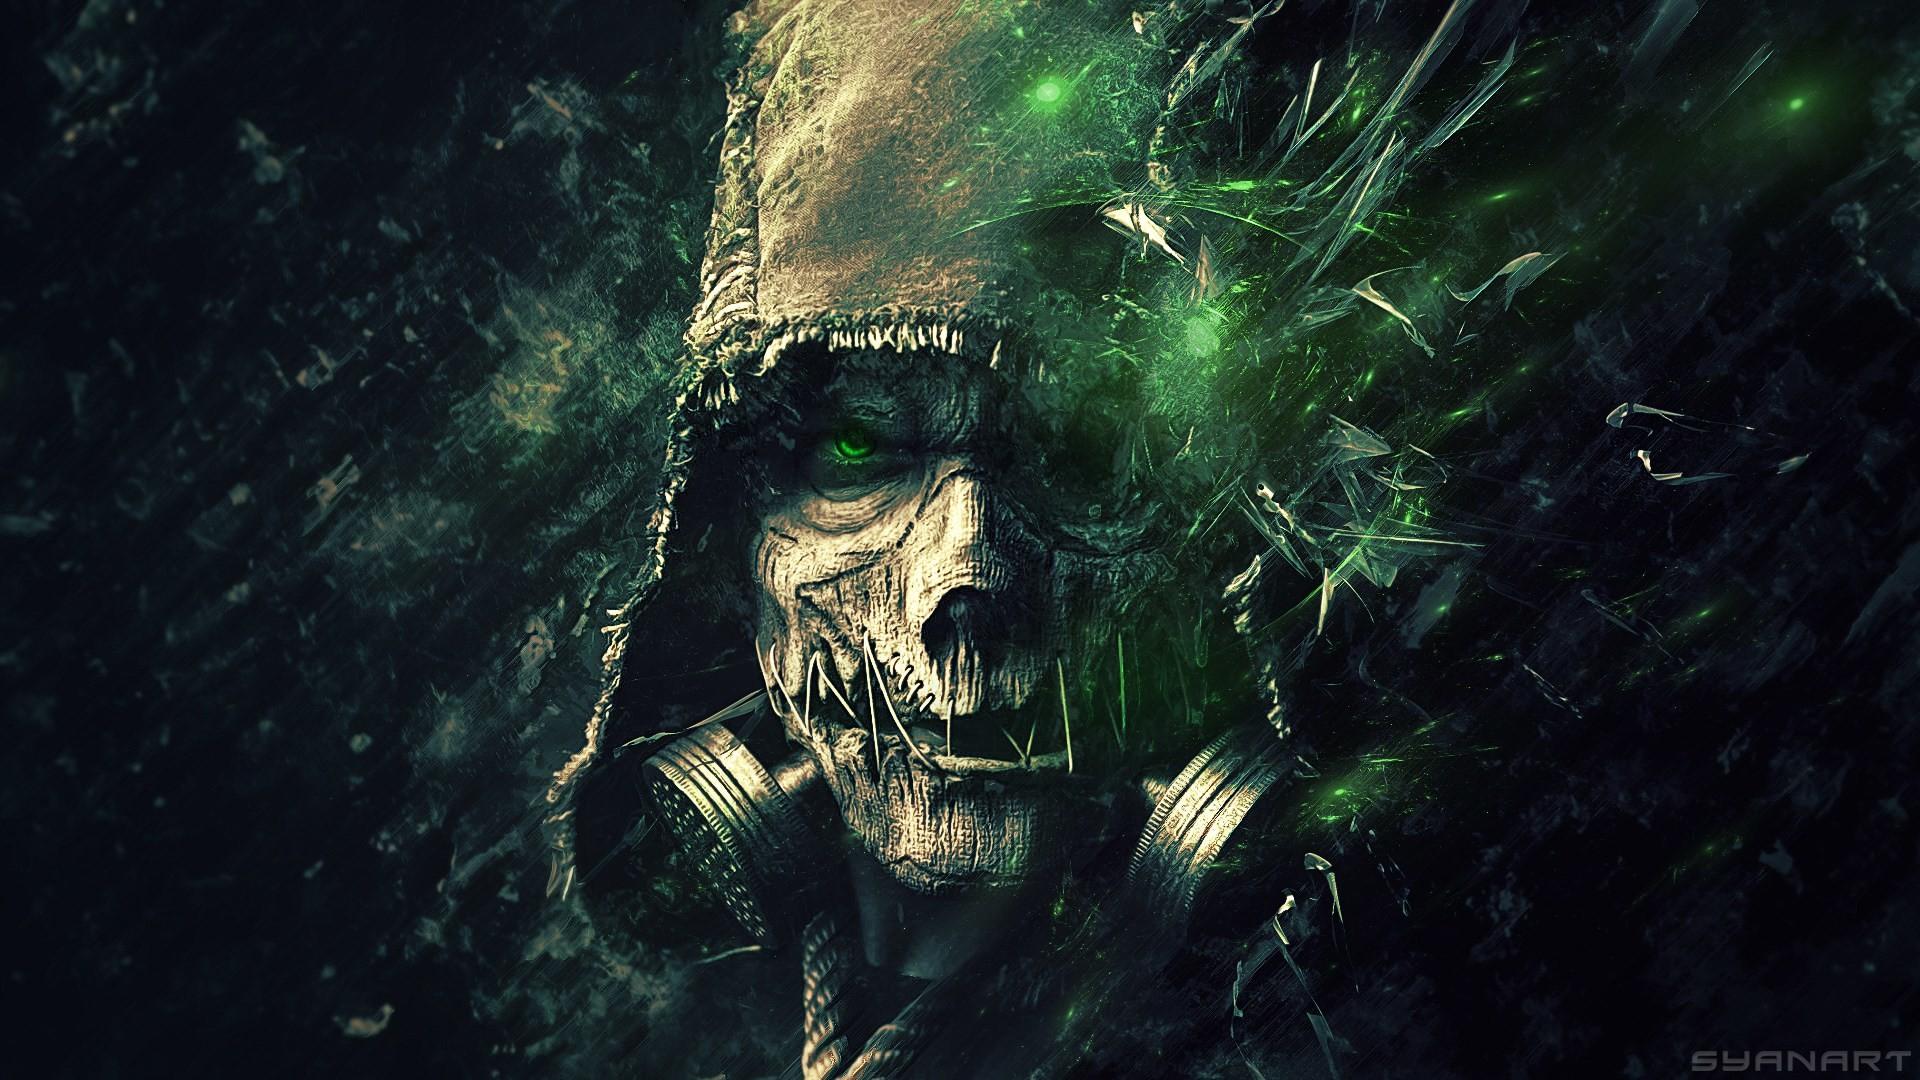 Edin Black – batman arkham knight background hd – px